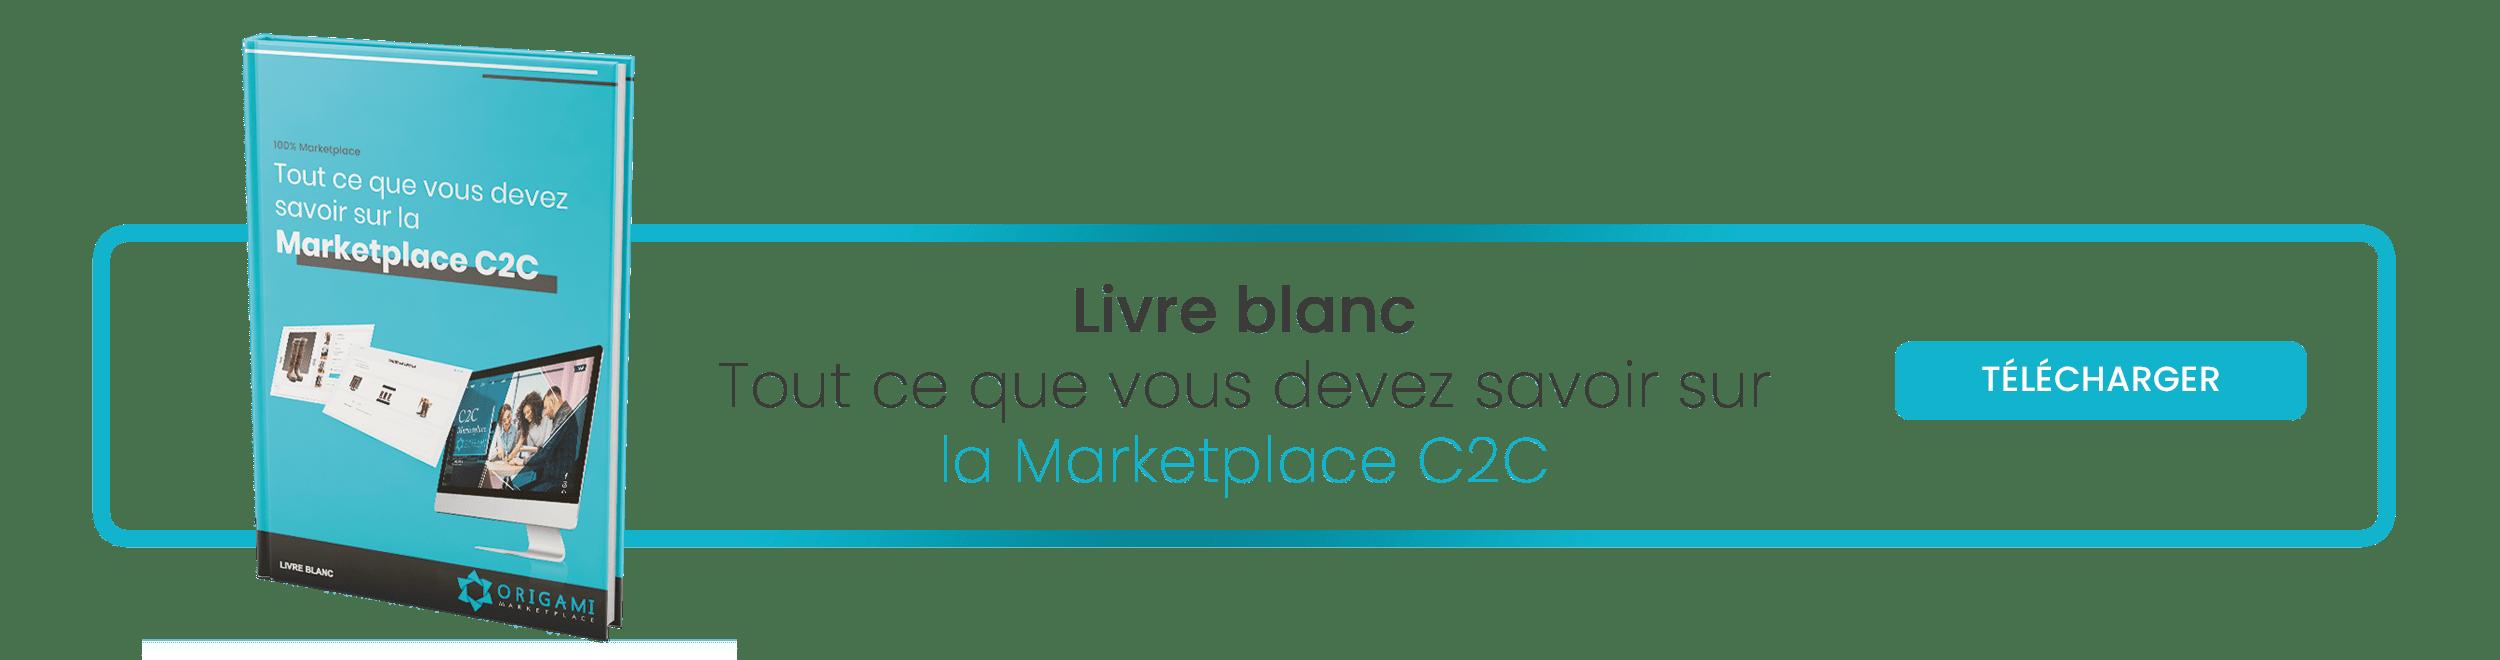 Livre blanc Marketplace C2C